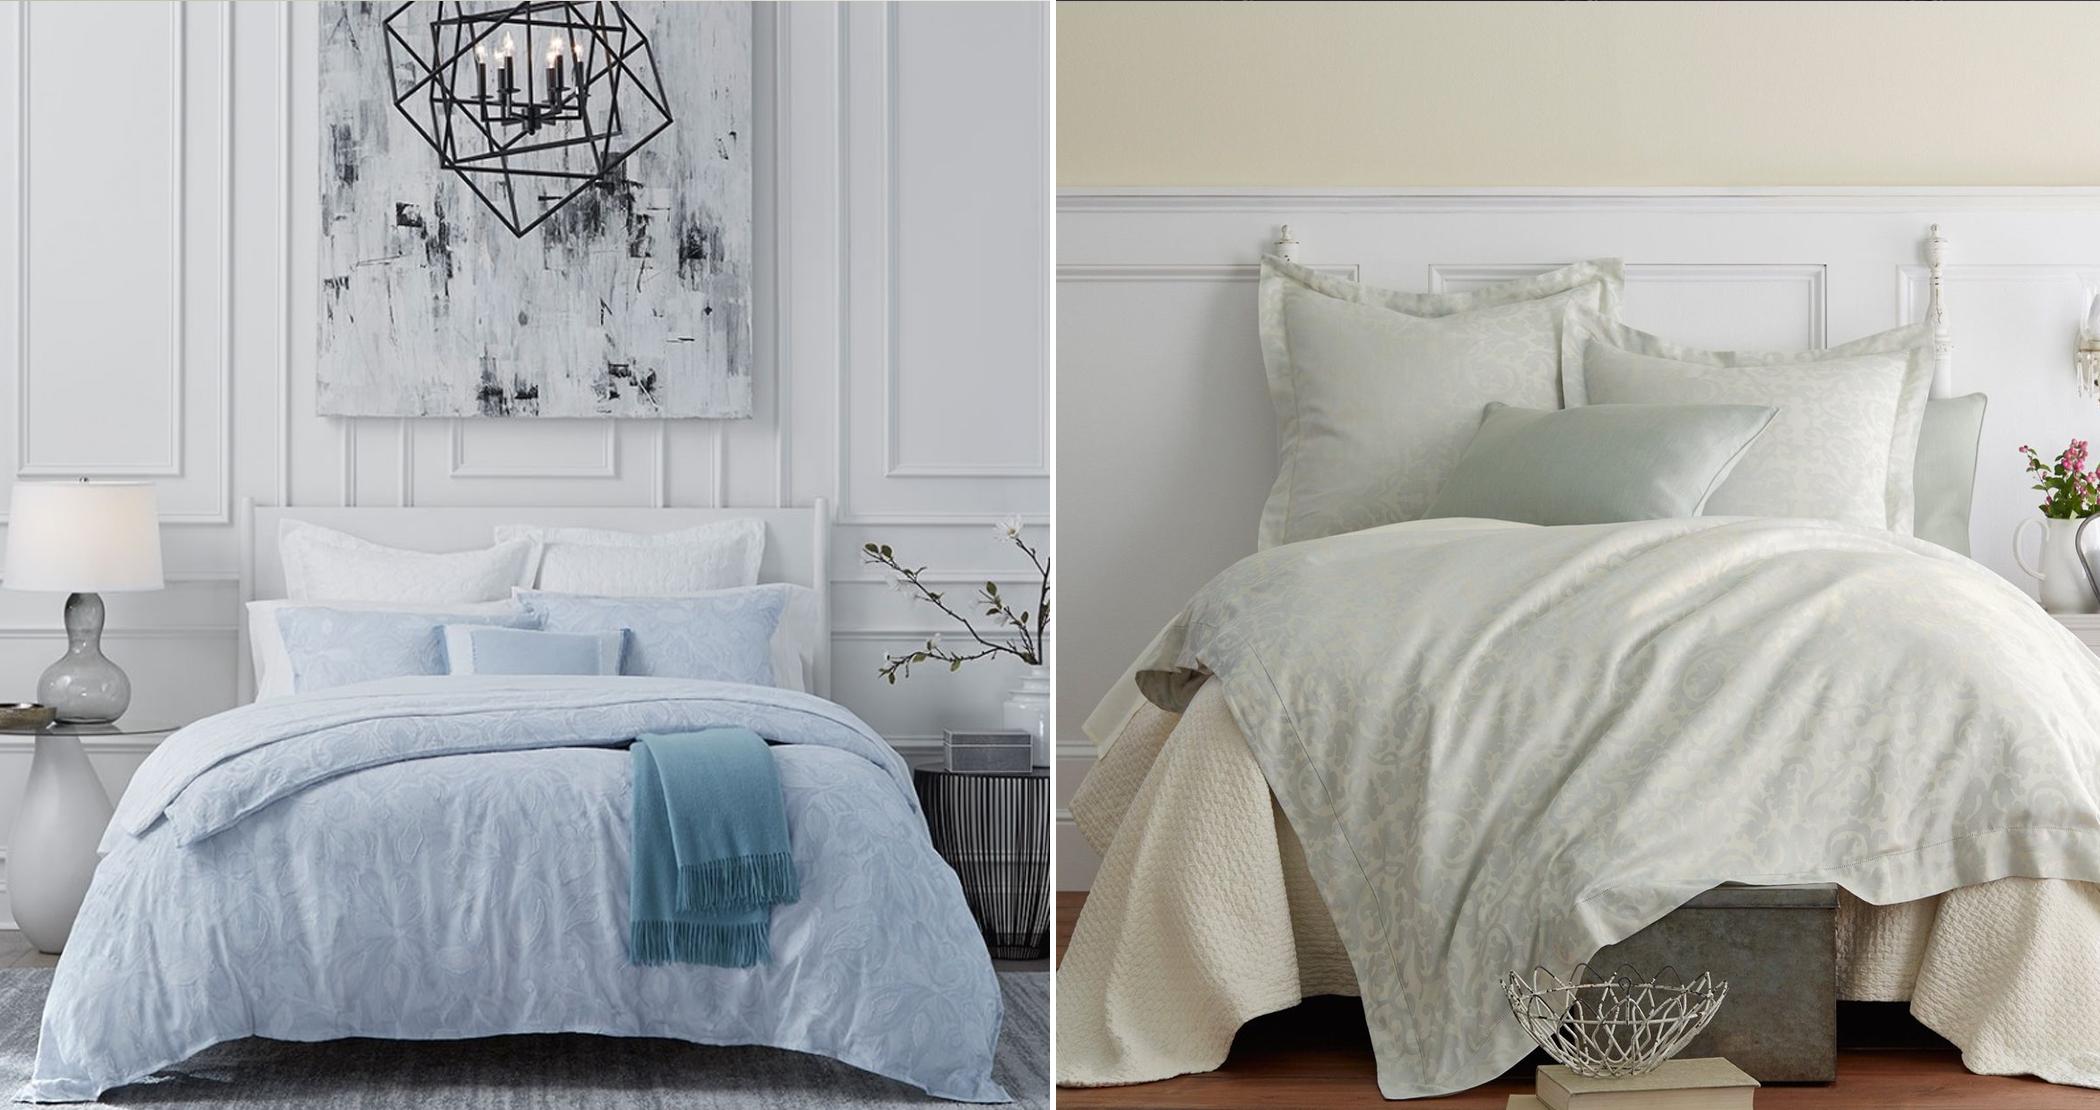 photo collage of bedroom interiors